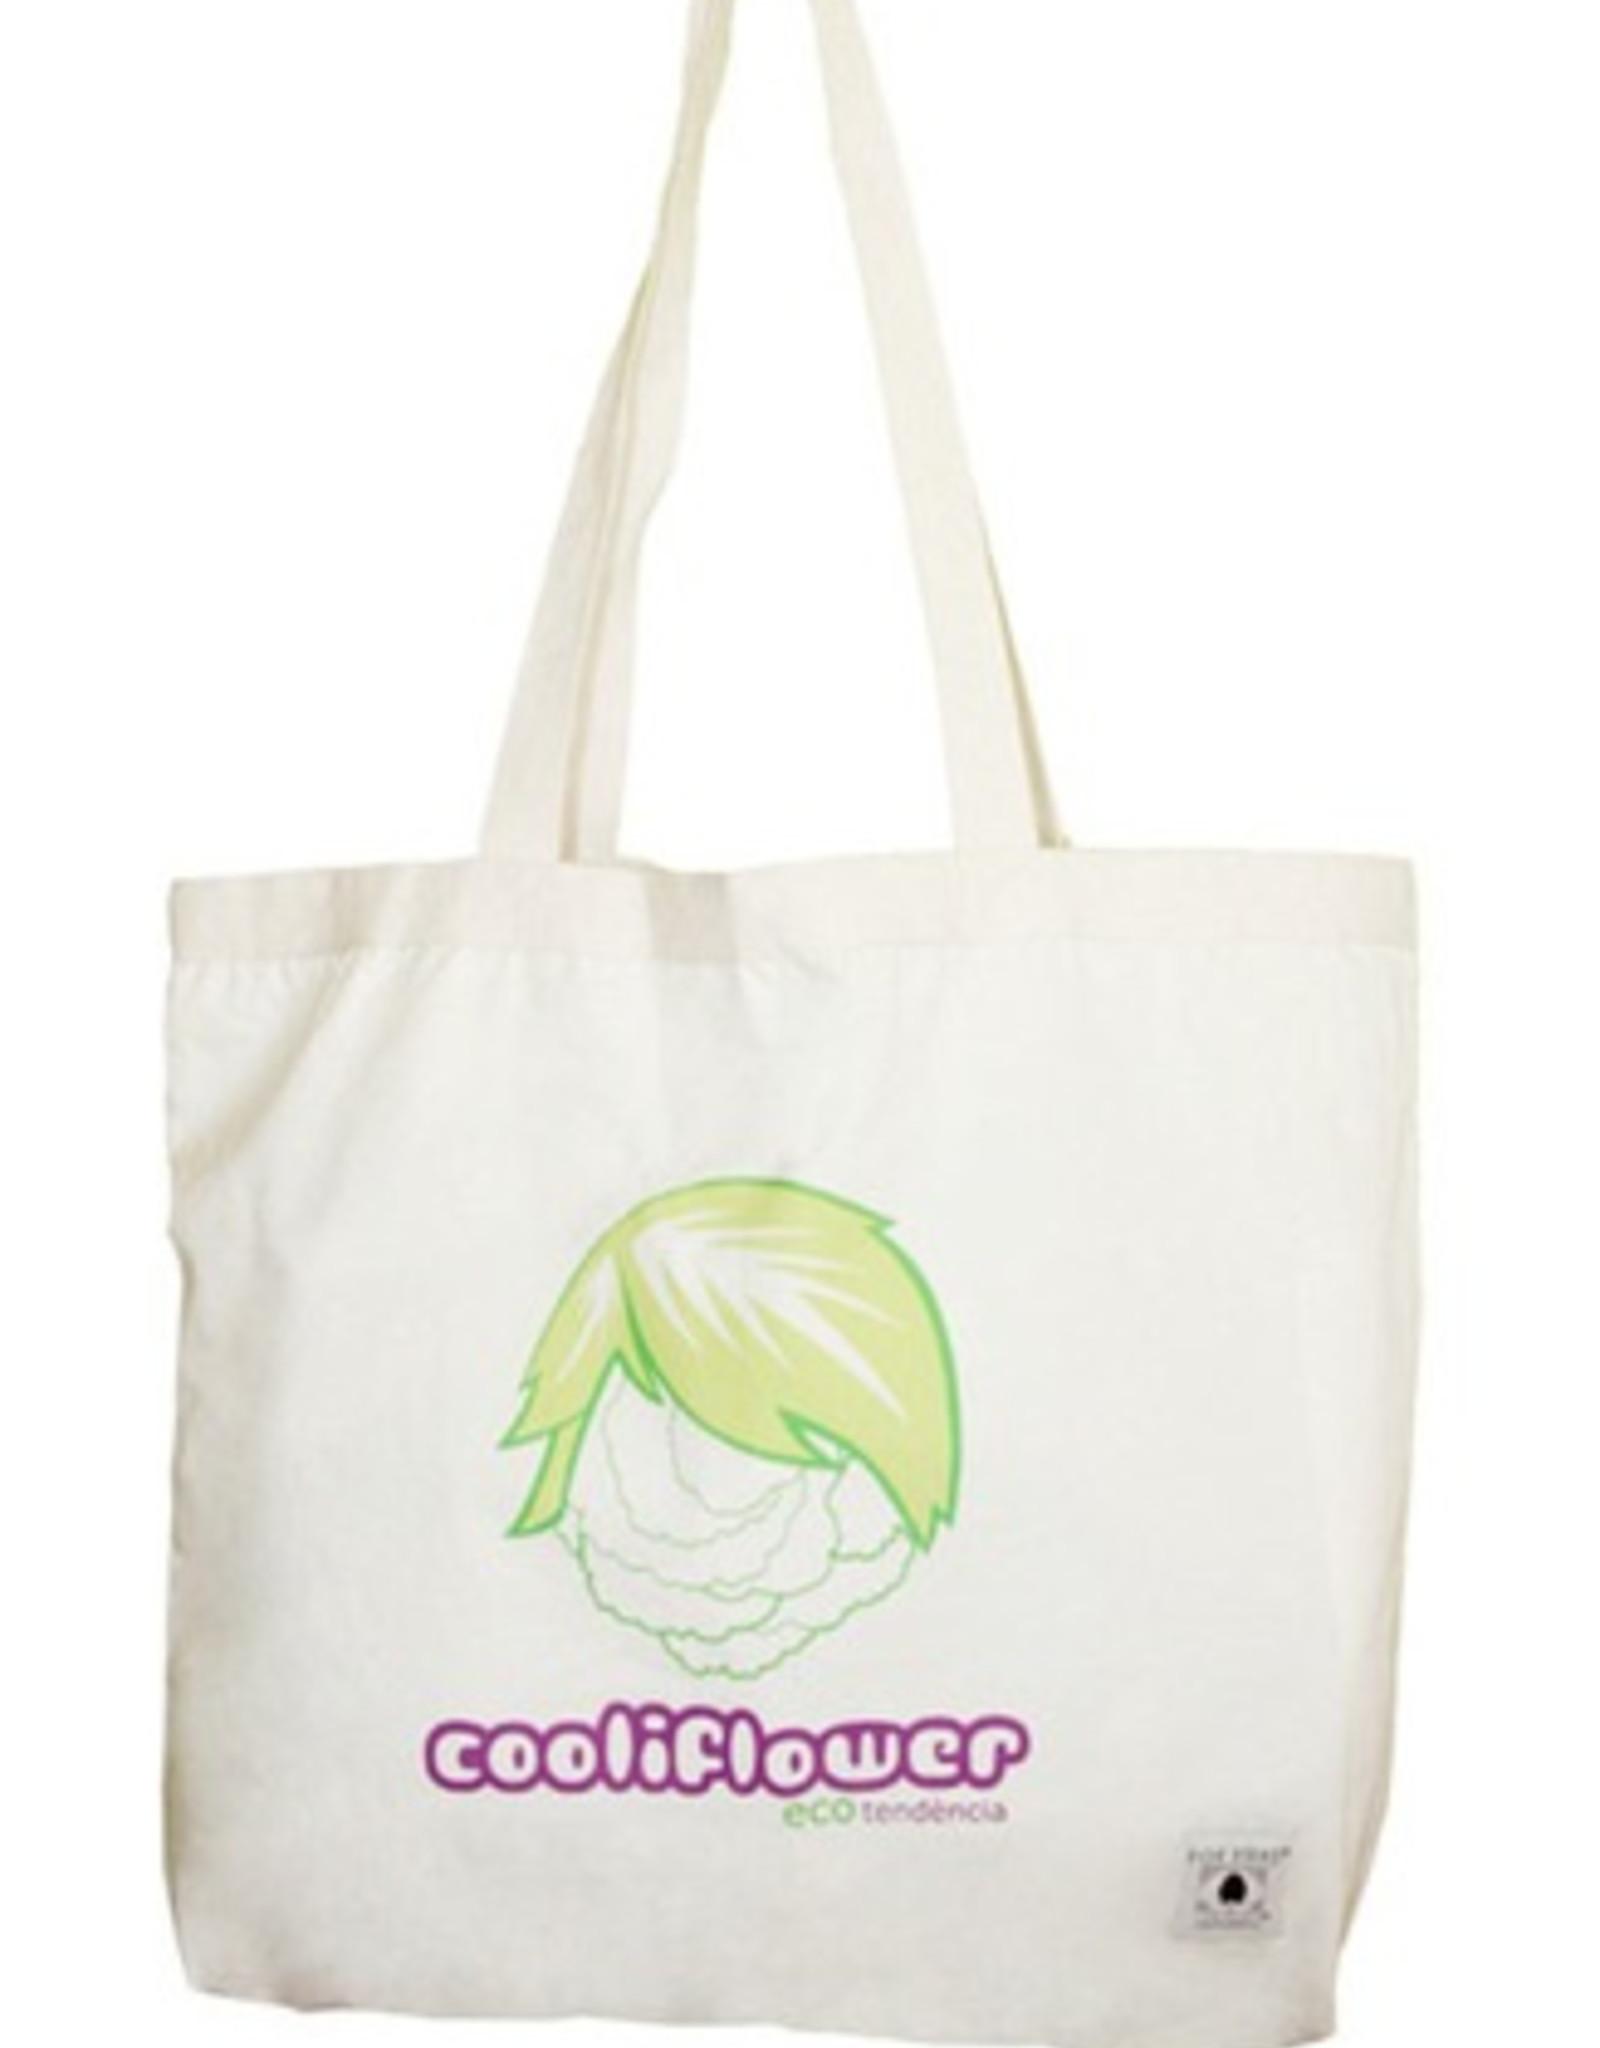 Cooliflower bag measures: 50x40